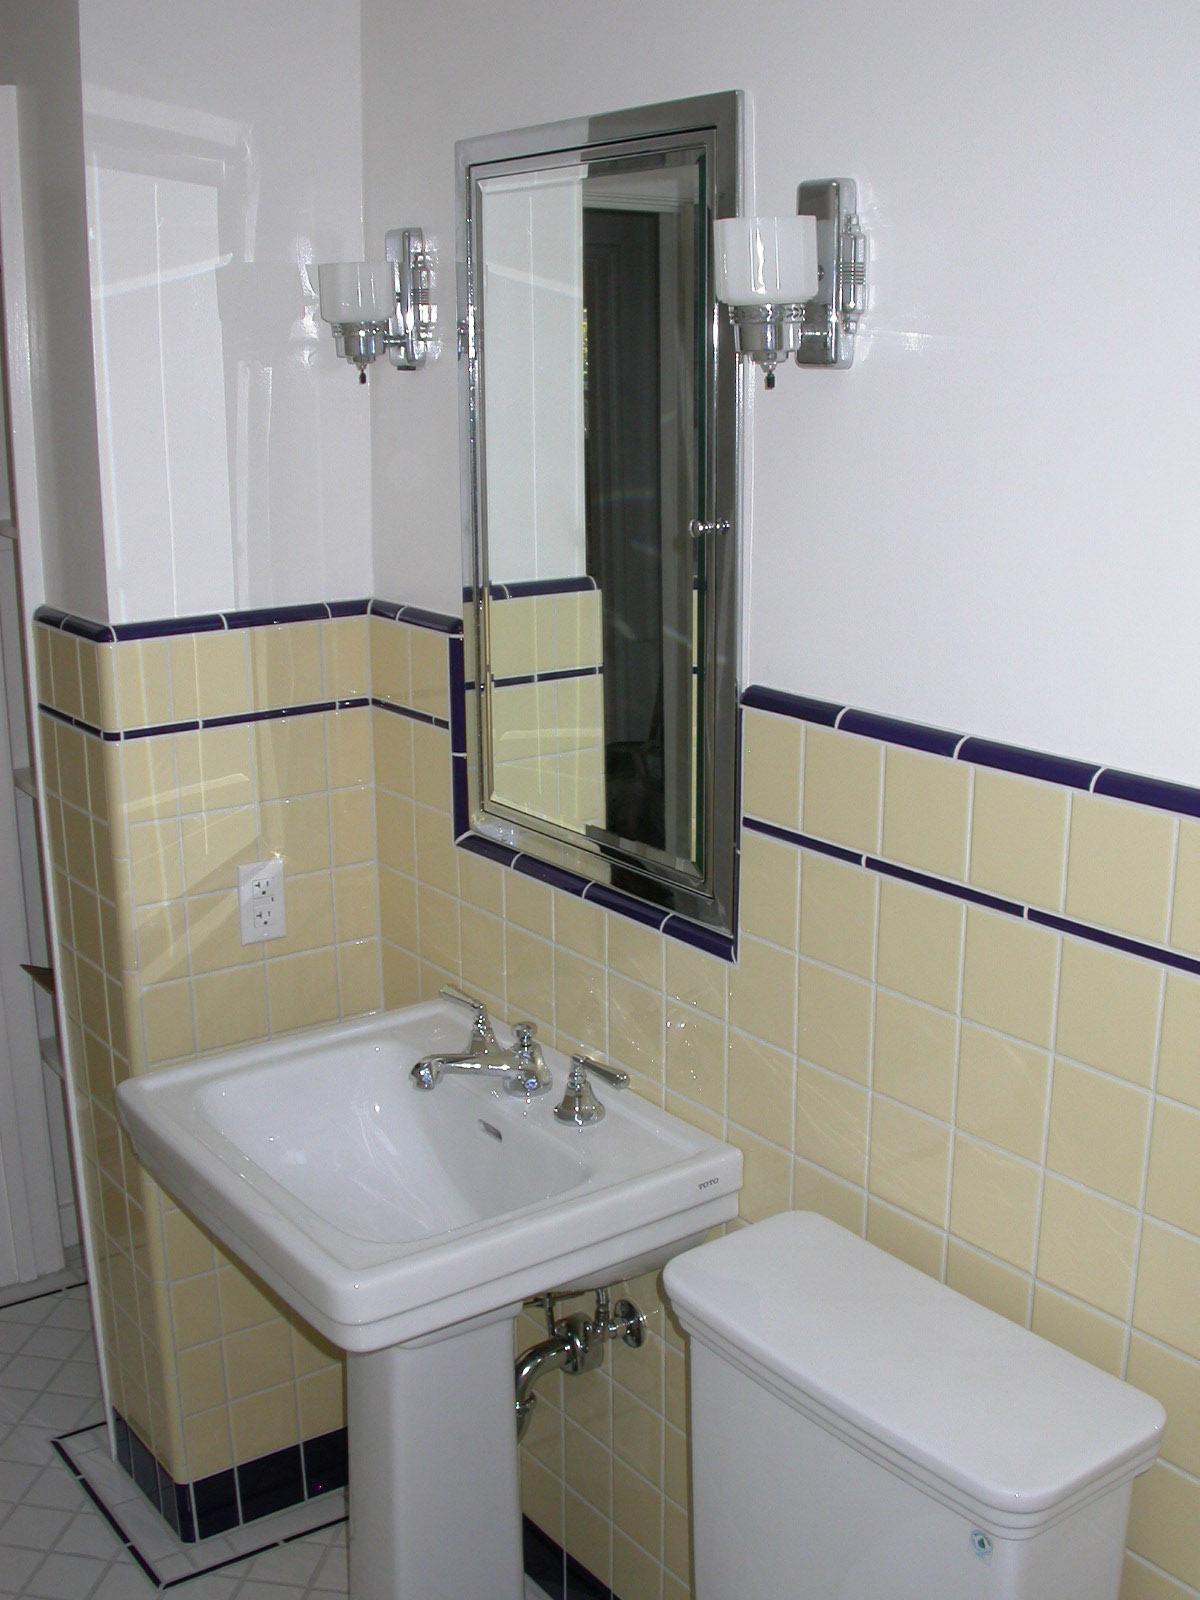 30 magnificent pictures and ideas art deco bathroom floor